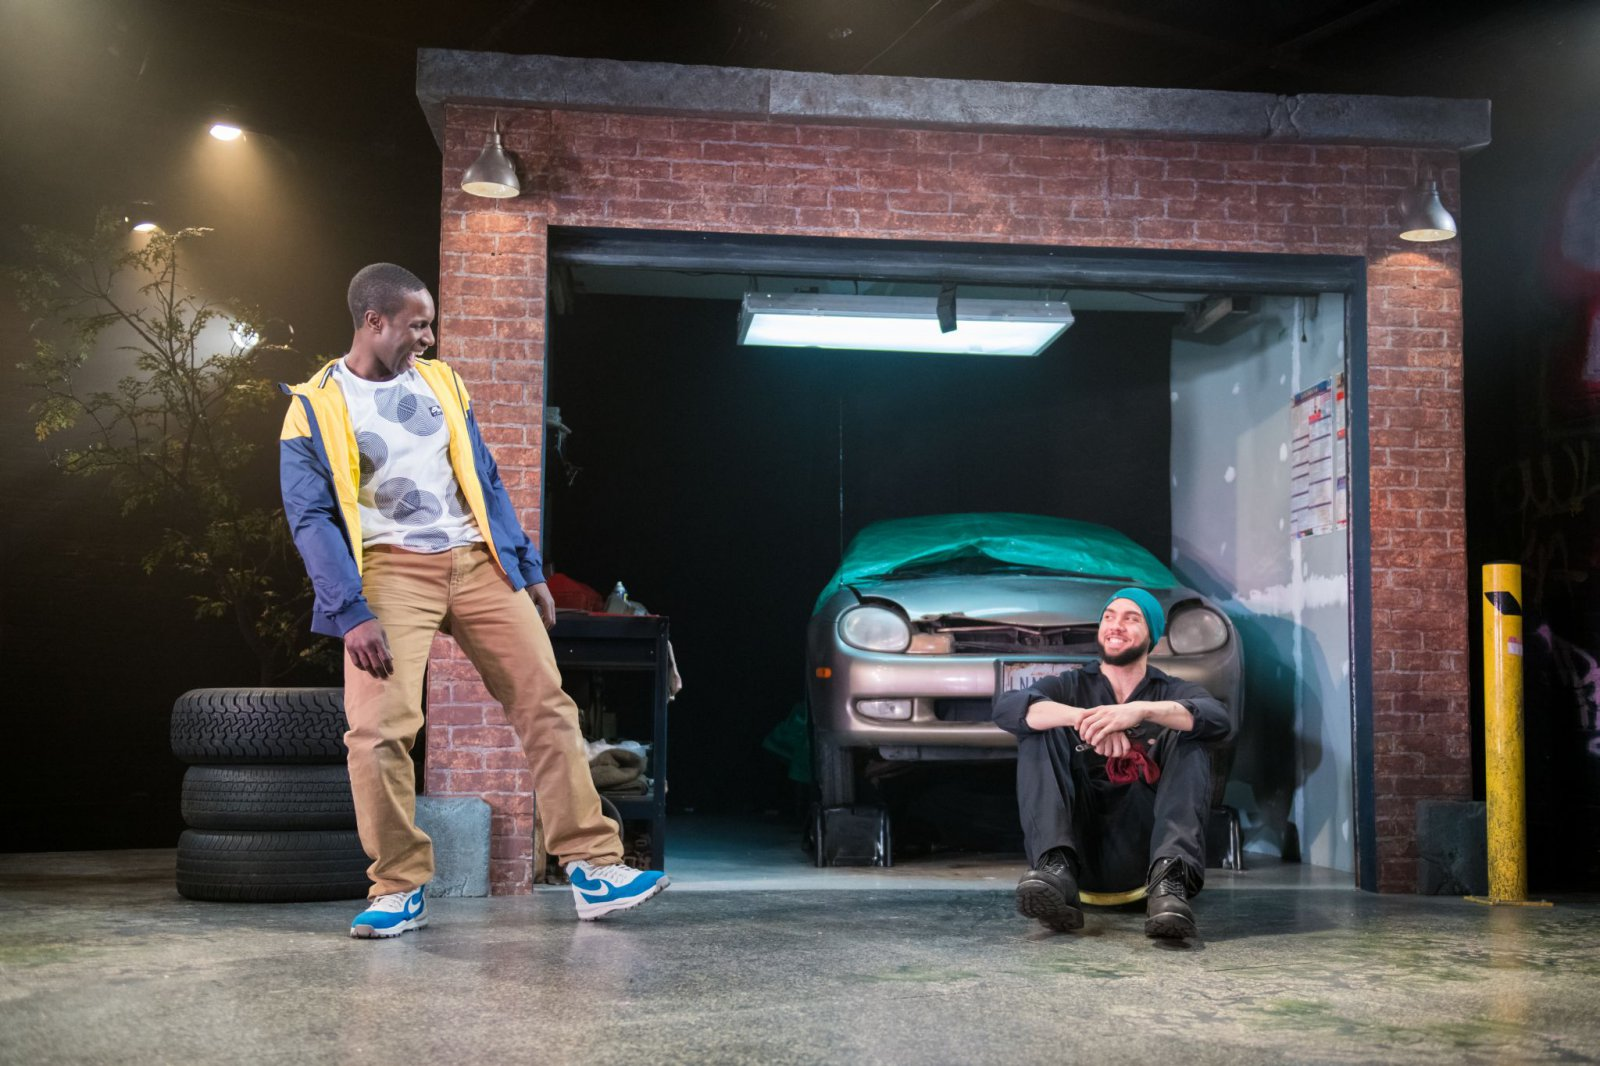 L-R: Andrew Muwonge as Oshoosi Size, Travis A. Knight as Ogun Size